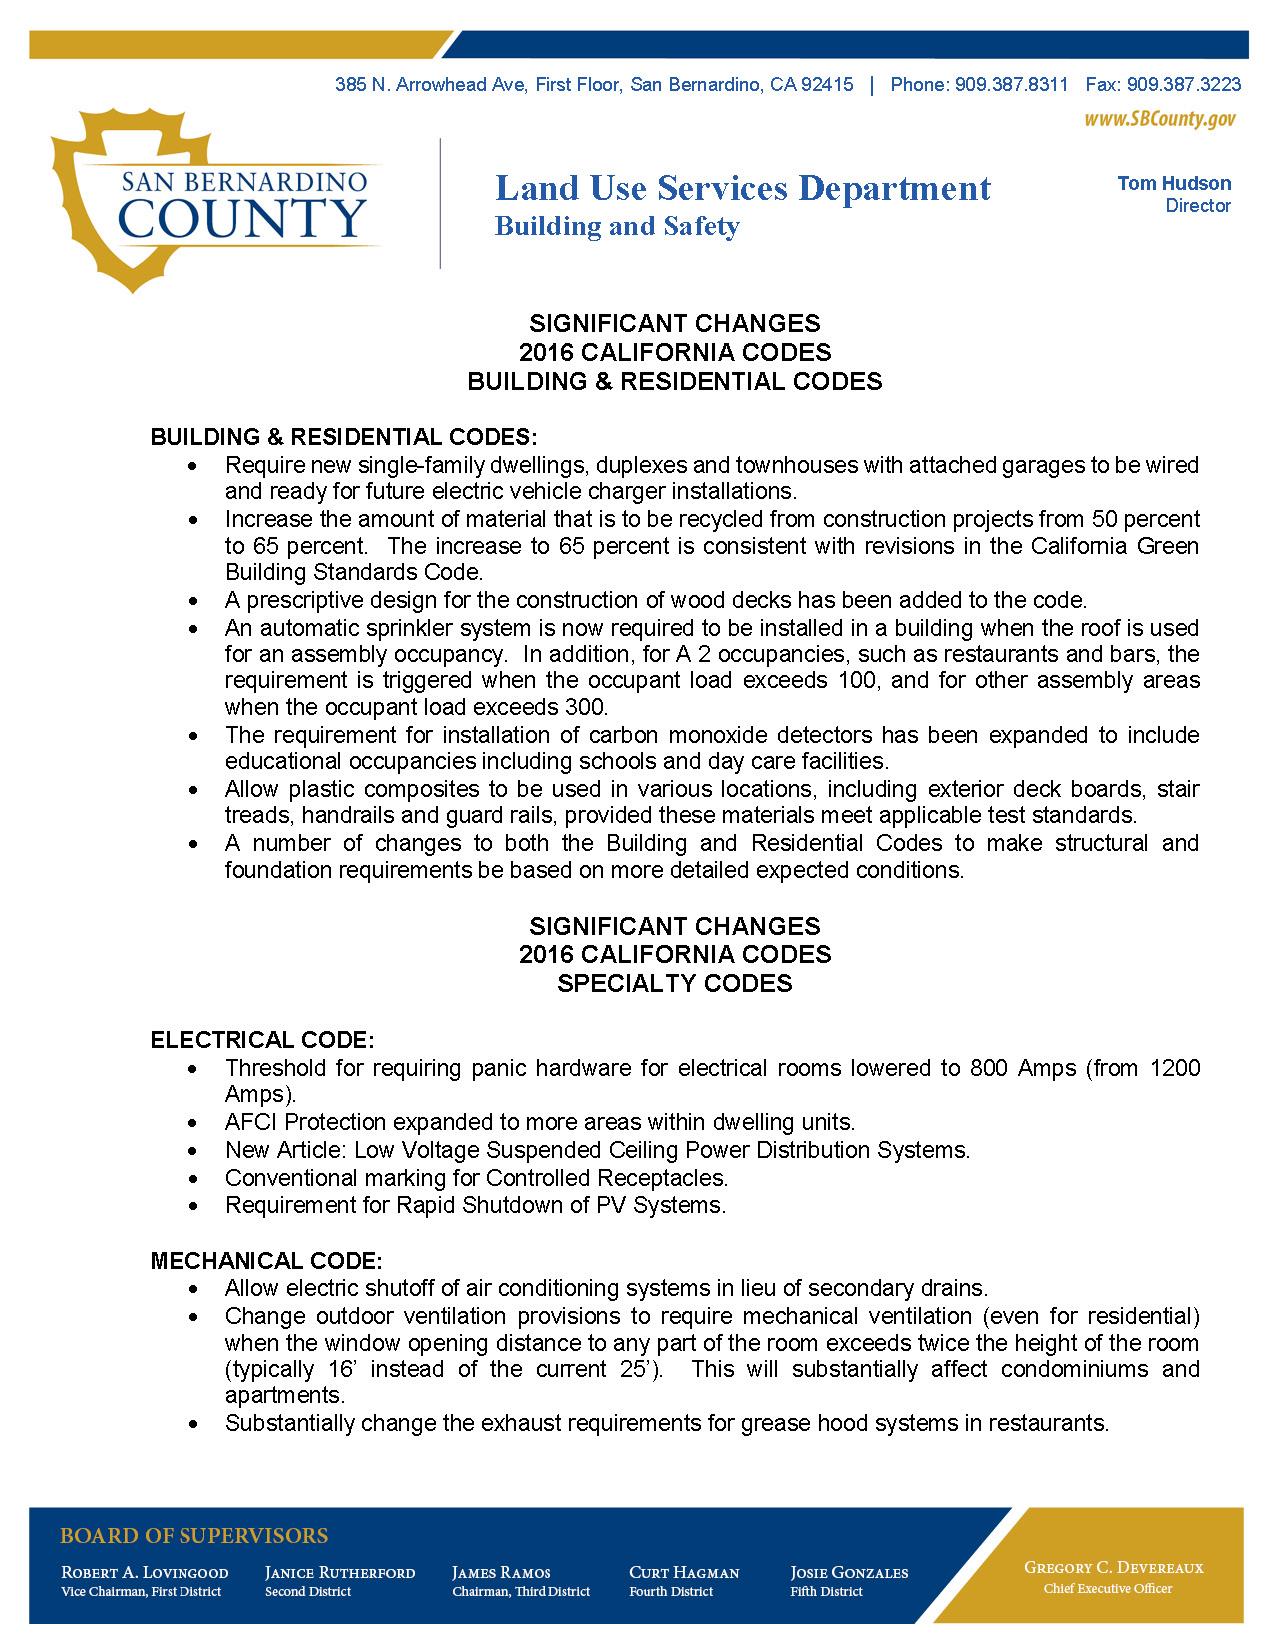 San Bernardino County Land-Use Services Department